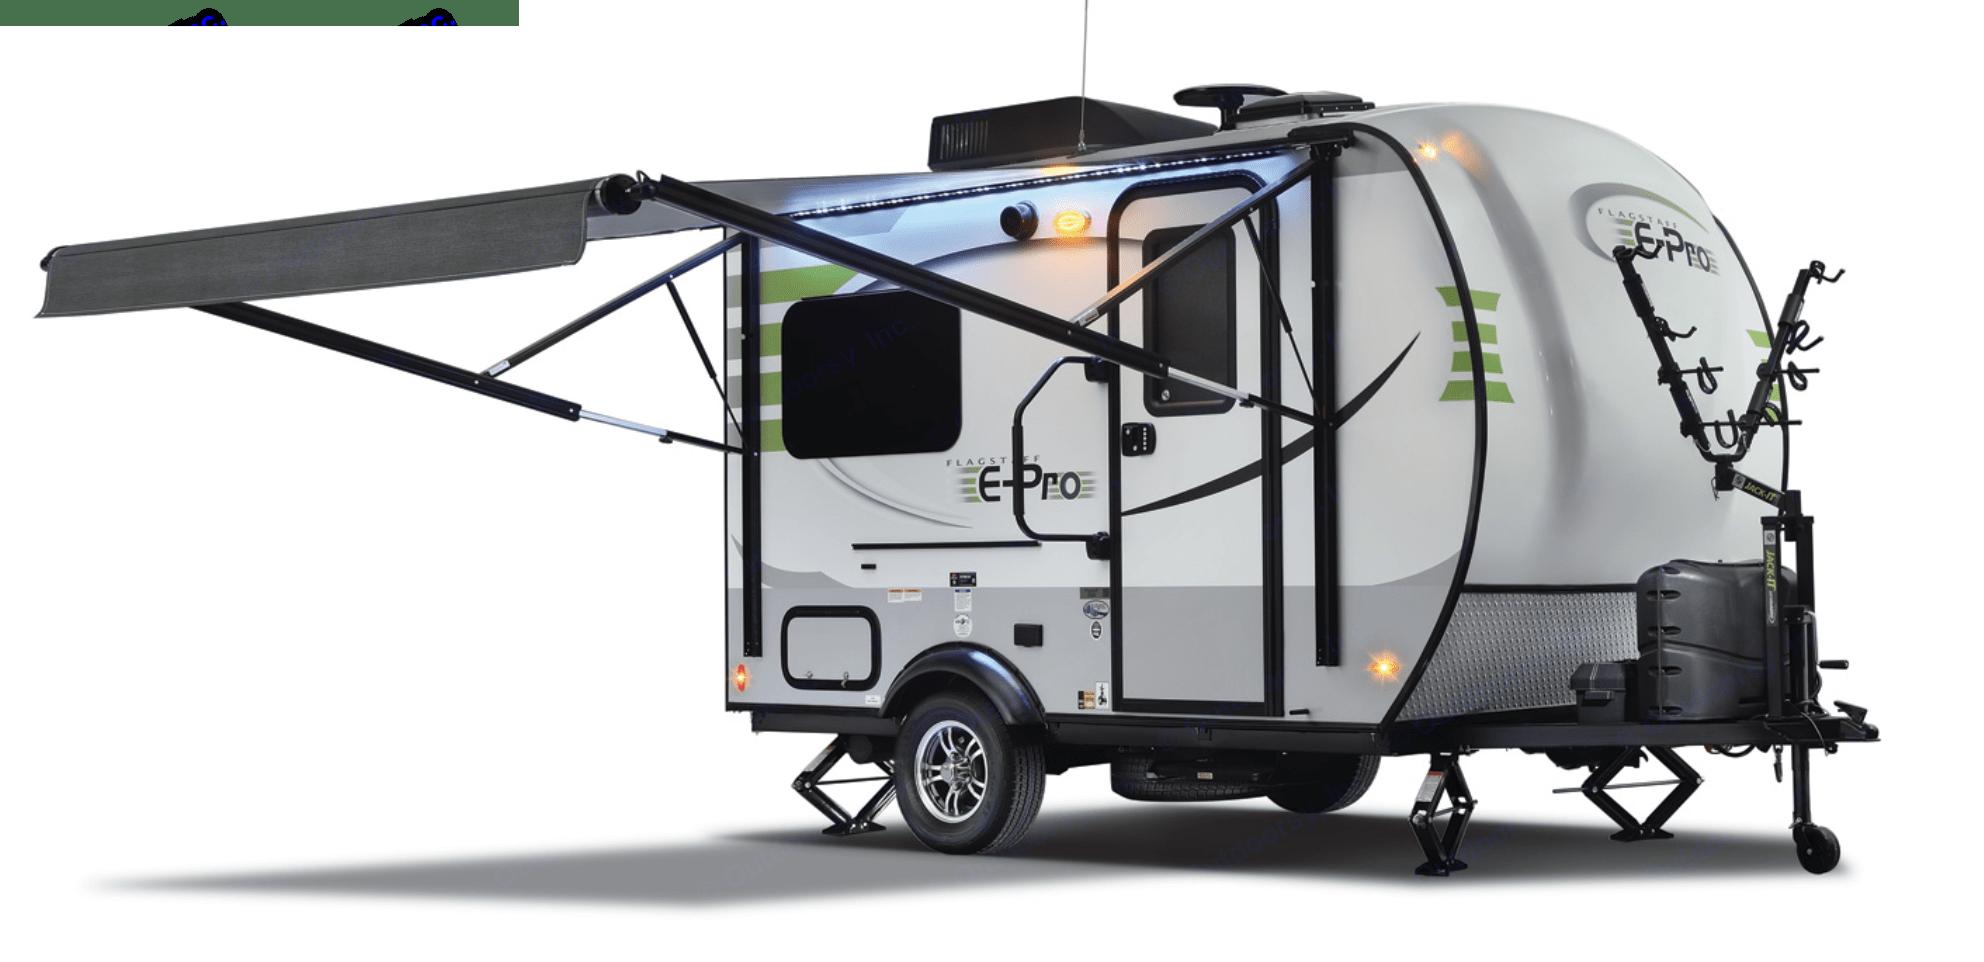 14' Micro Trailer - 2 Person with bath. Flagstaff E-Pro 14' Longs Peak 2018